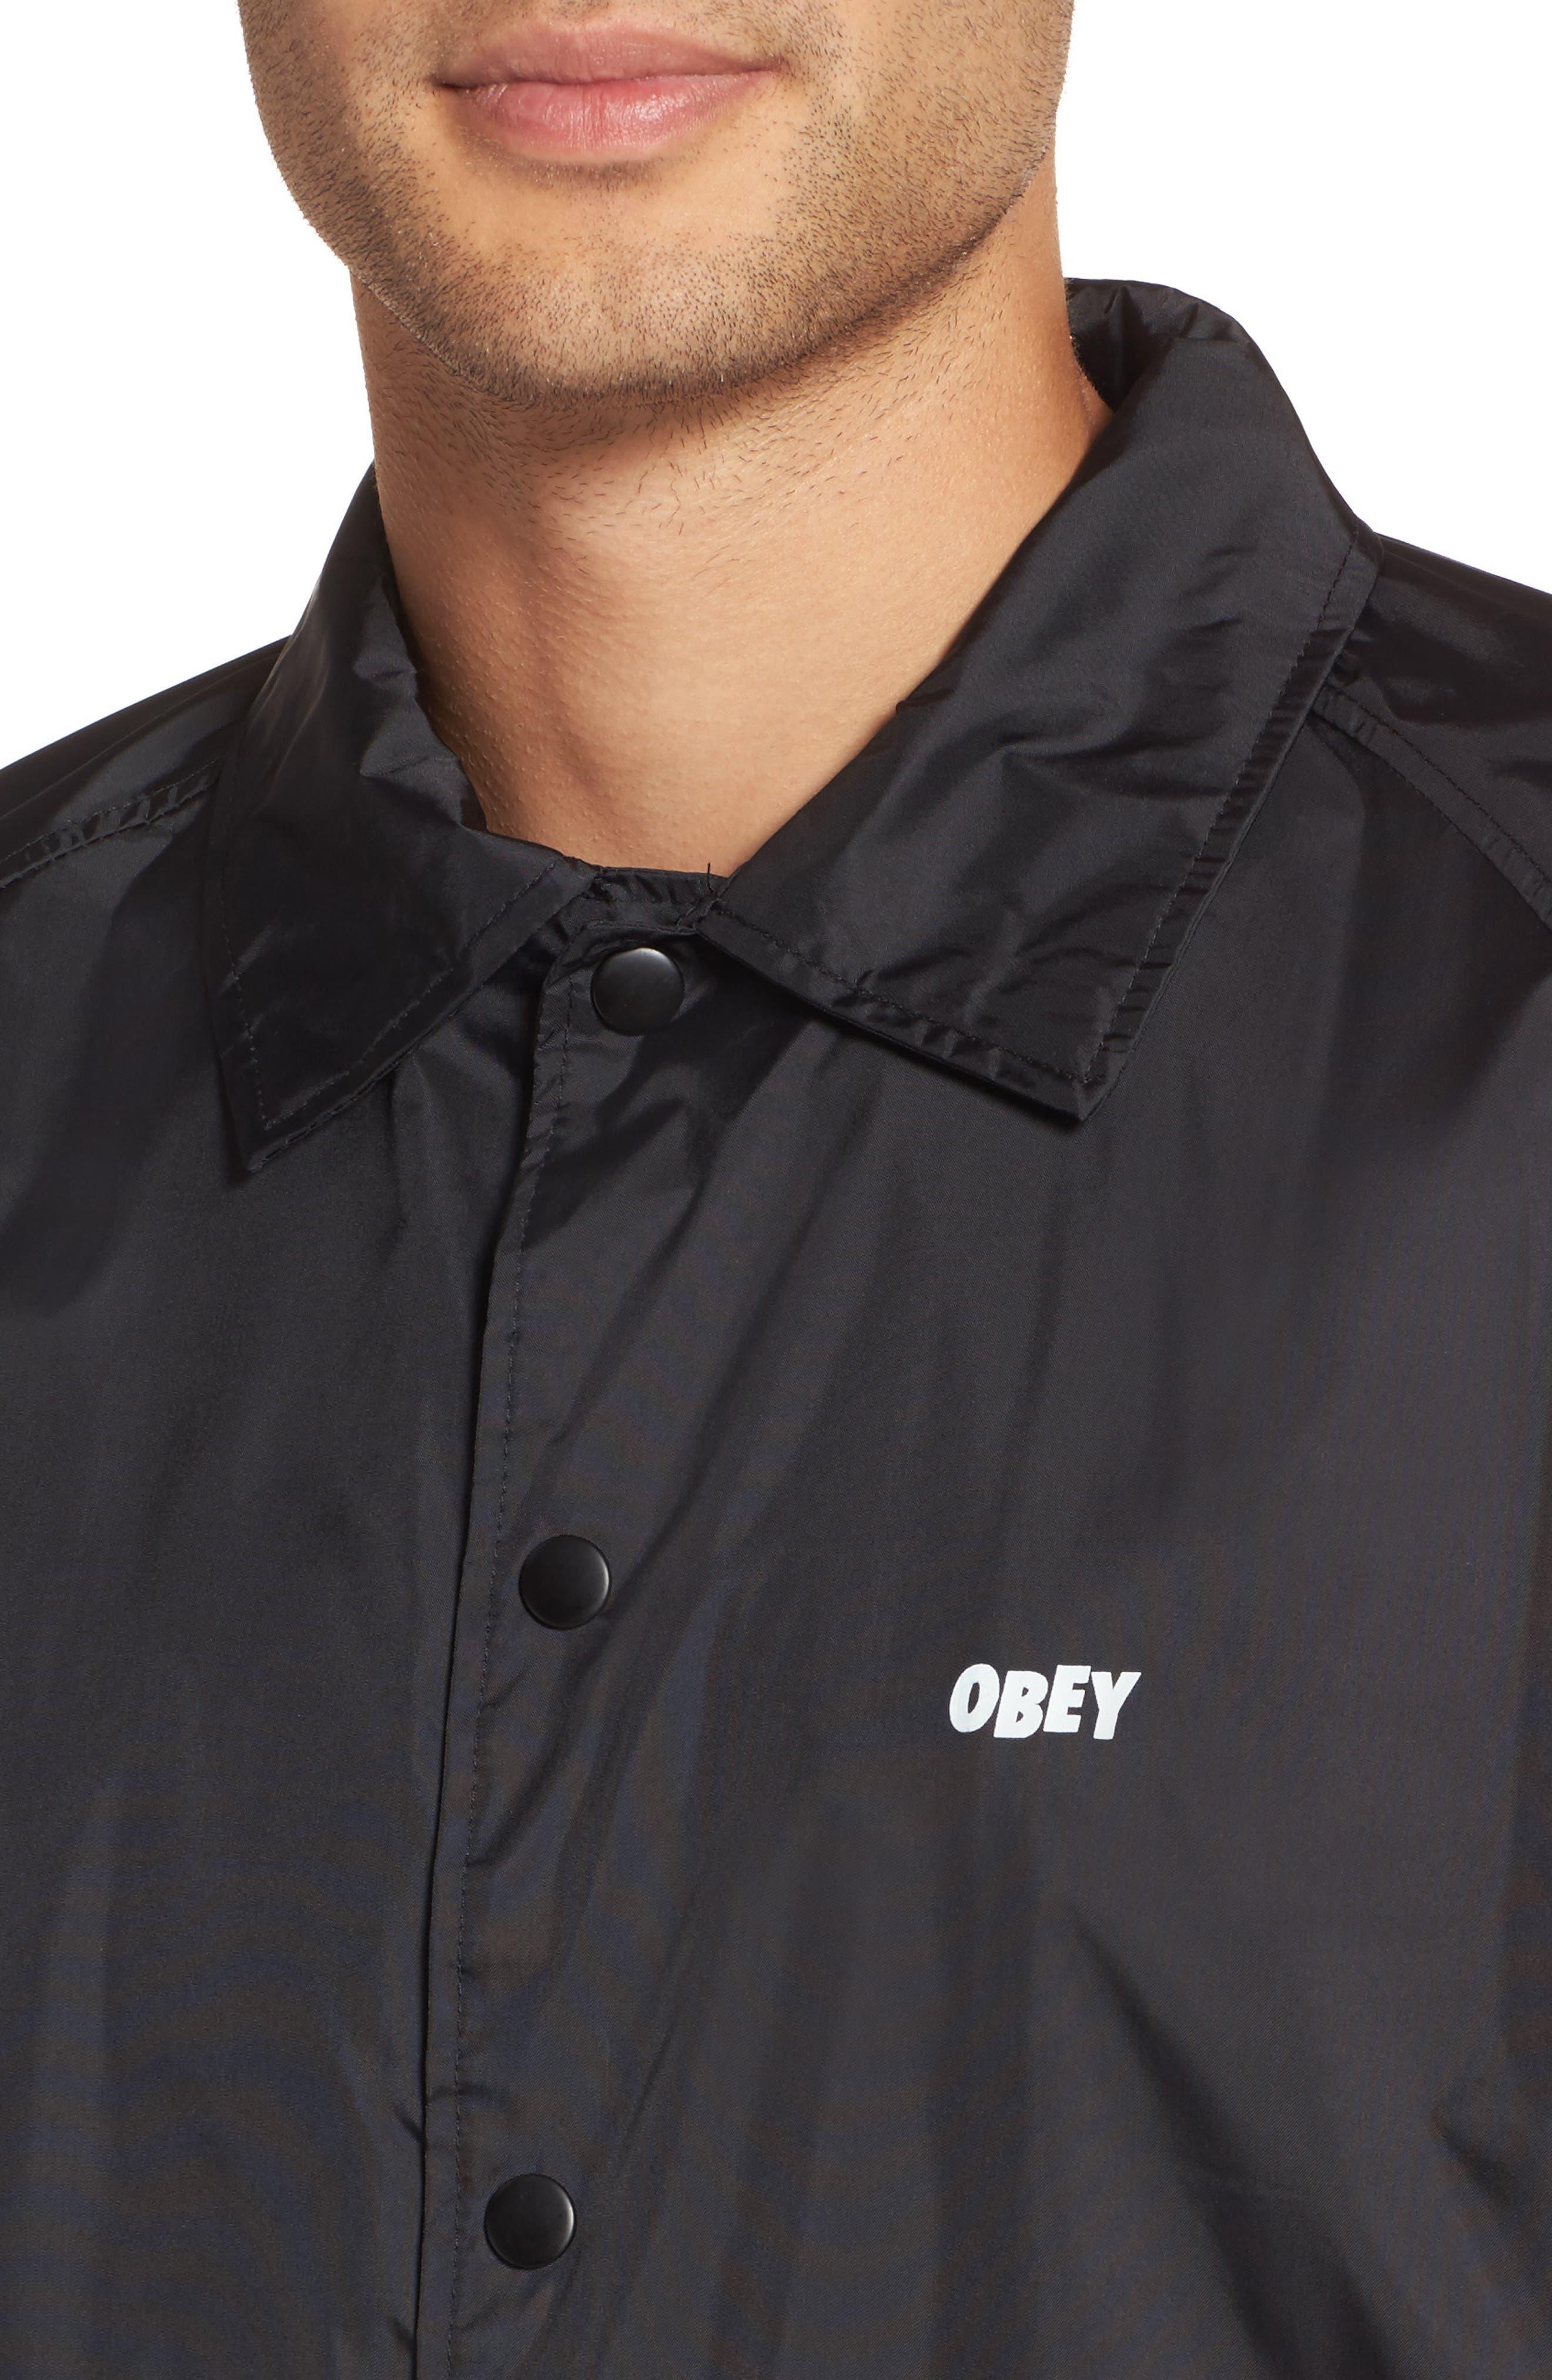 Lo-Fi Graphic Coach's Jacket,                             Alternate thumbnail 4, color,                             001